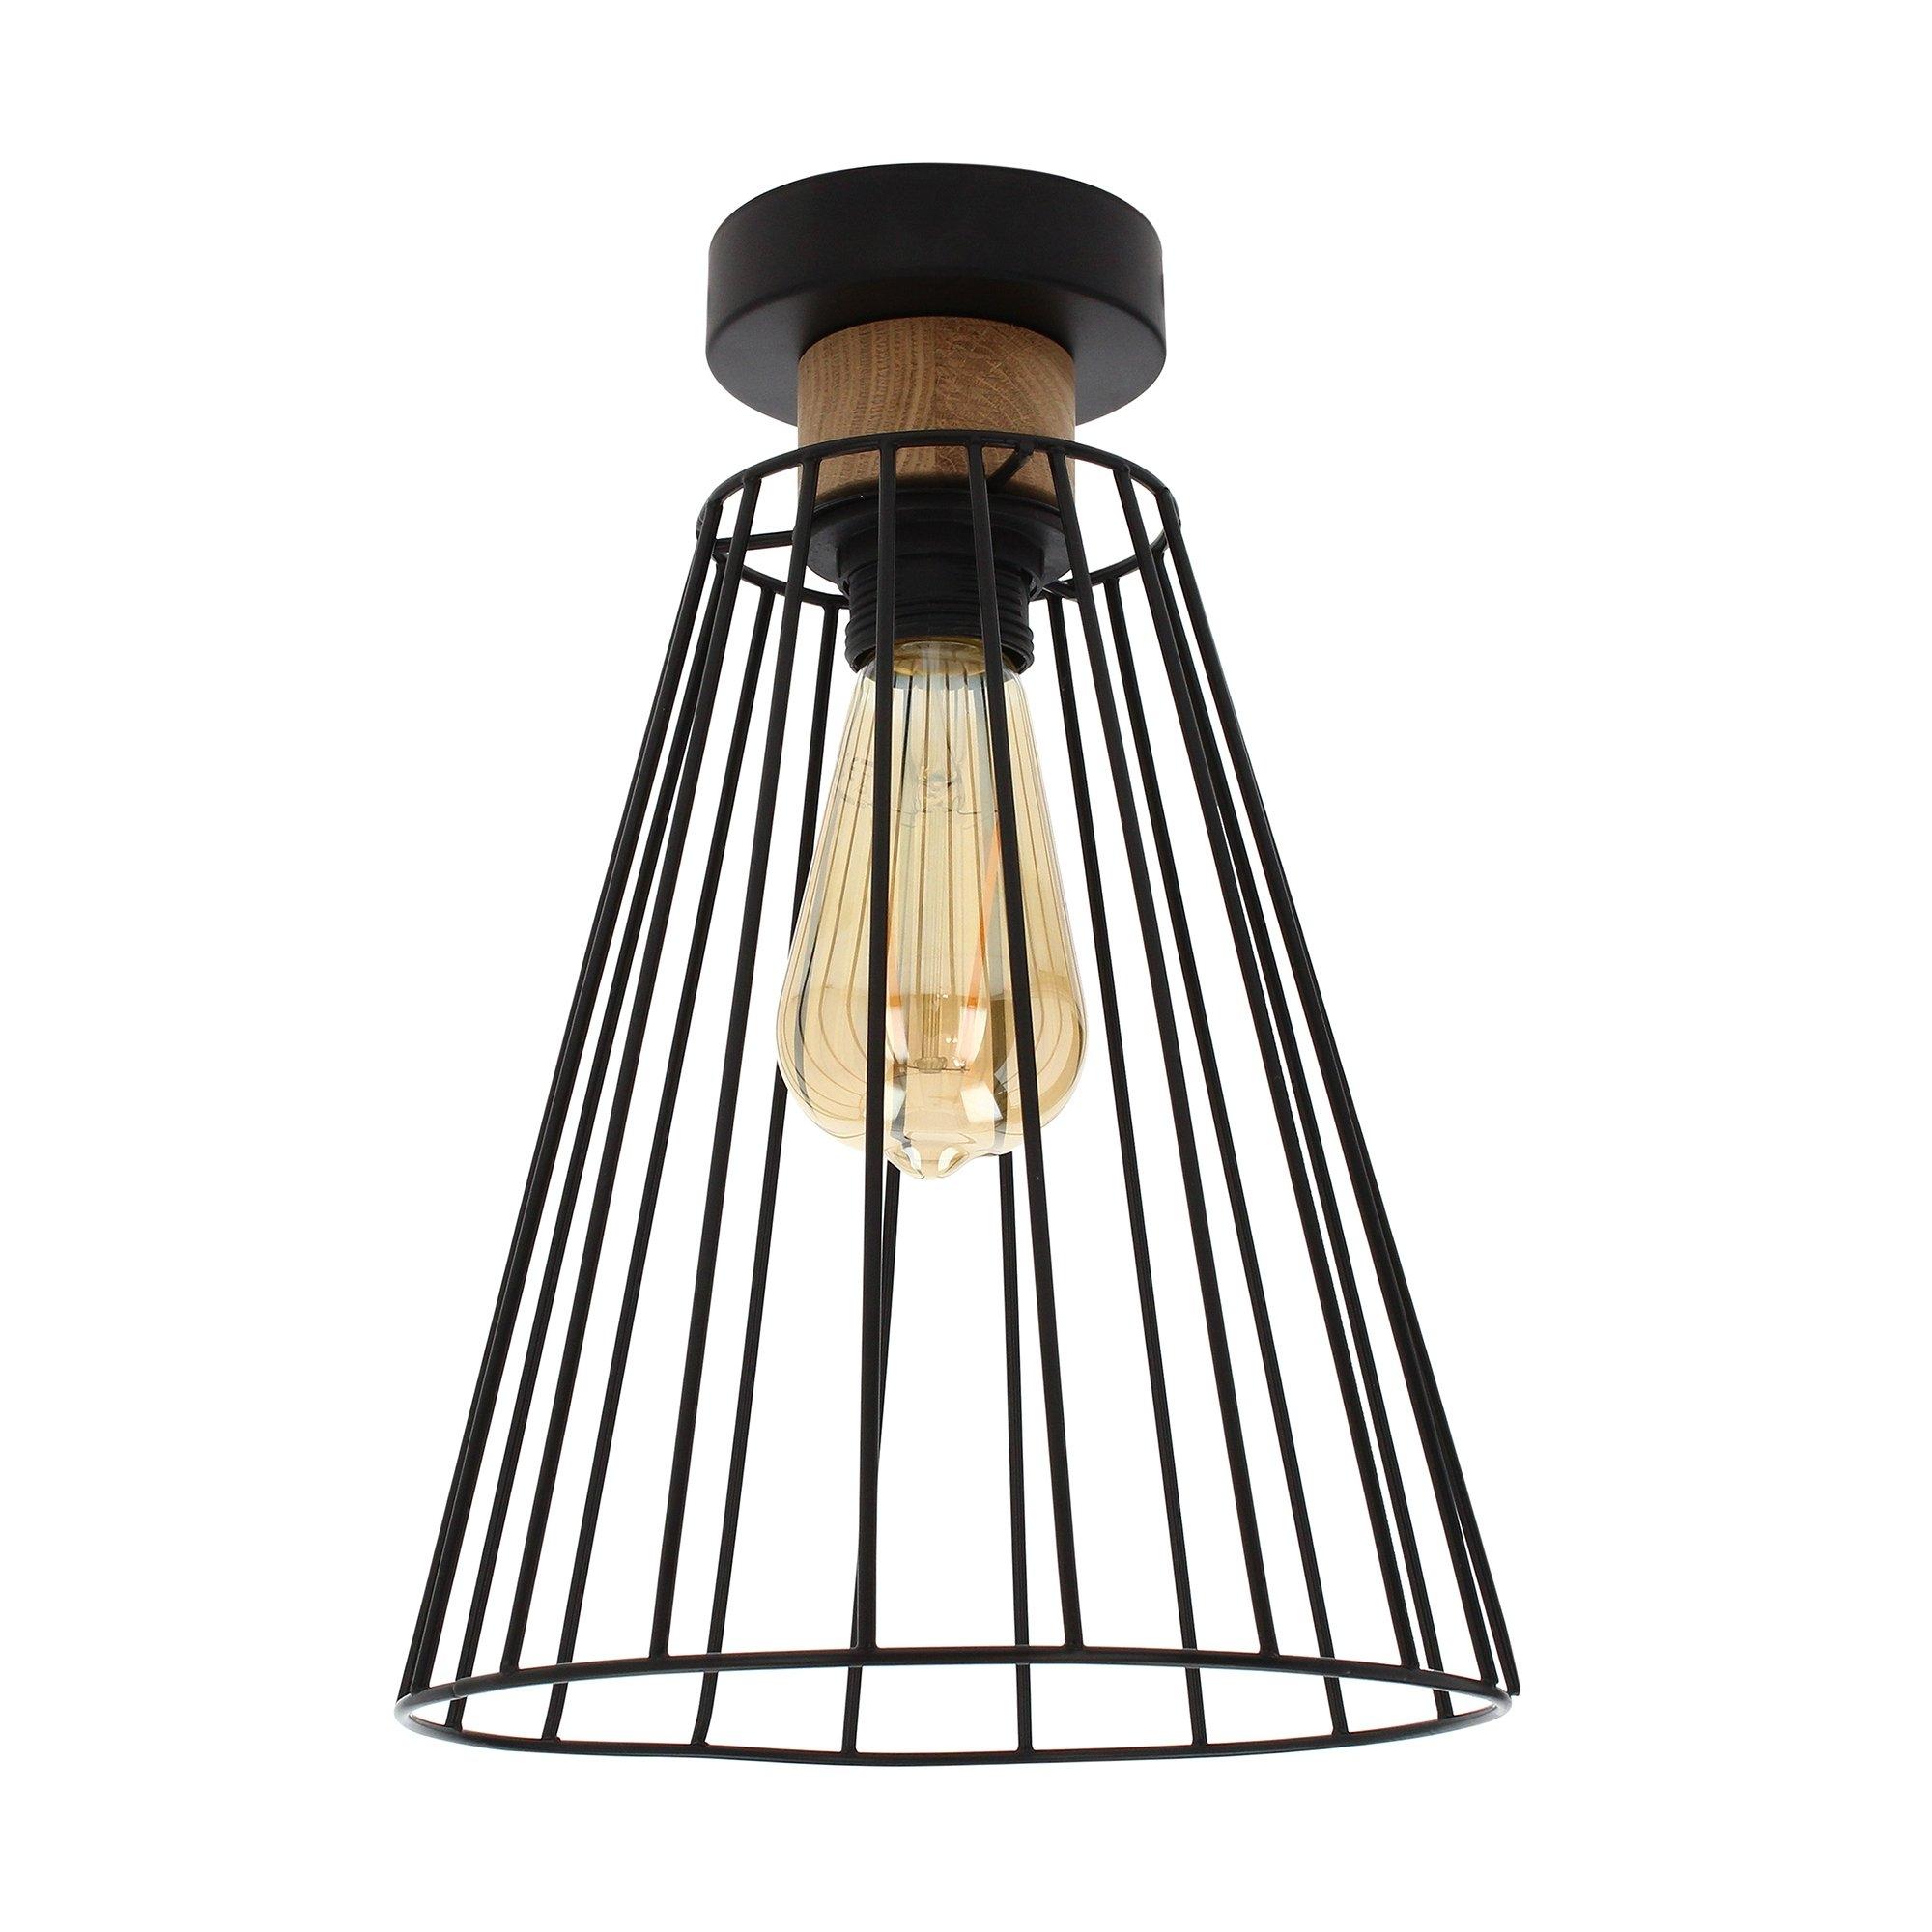 SPOT Light plafondlamp GUNNAR Moderne kooi-look, van metaal en eikenhout, bijpassende LM E27 / exclusive, Made in Europe goedkoop op otto.nl kopen